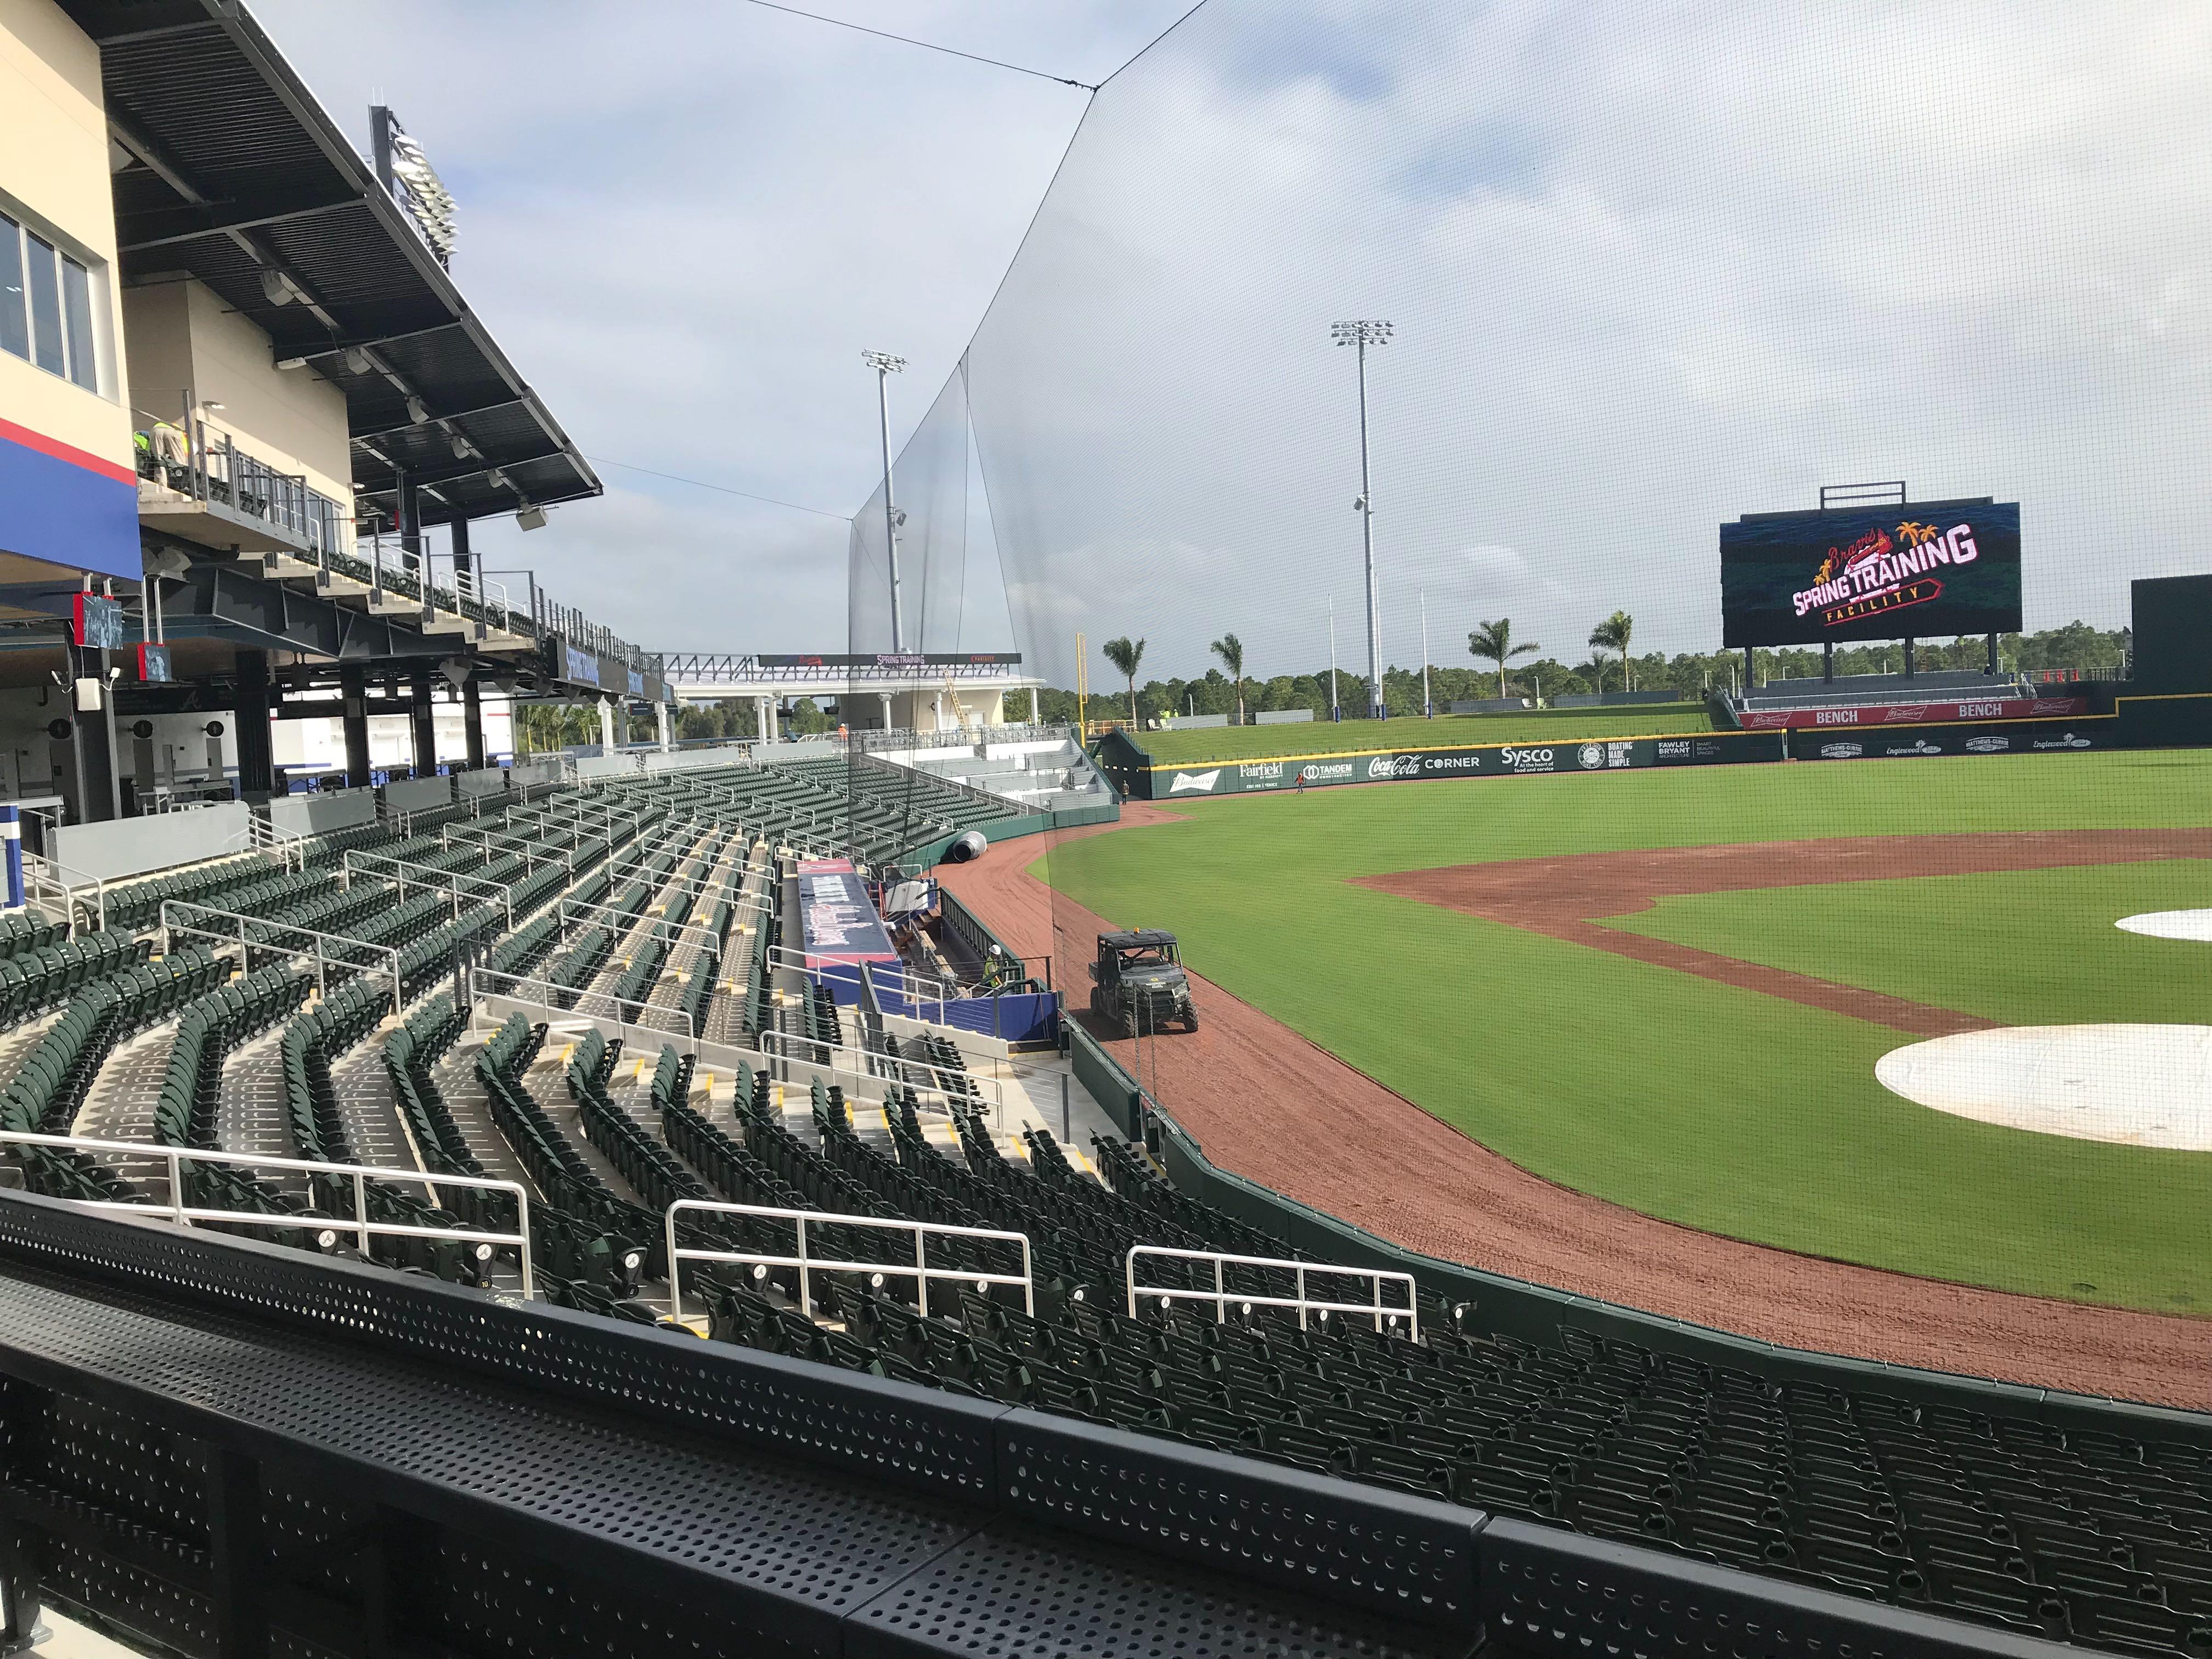 Atlanta Braves Open New Spring Training Home In North Port